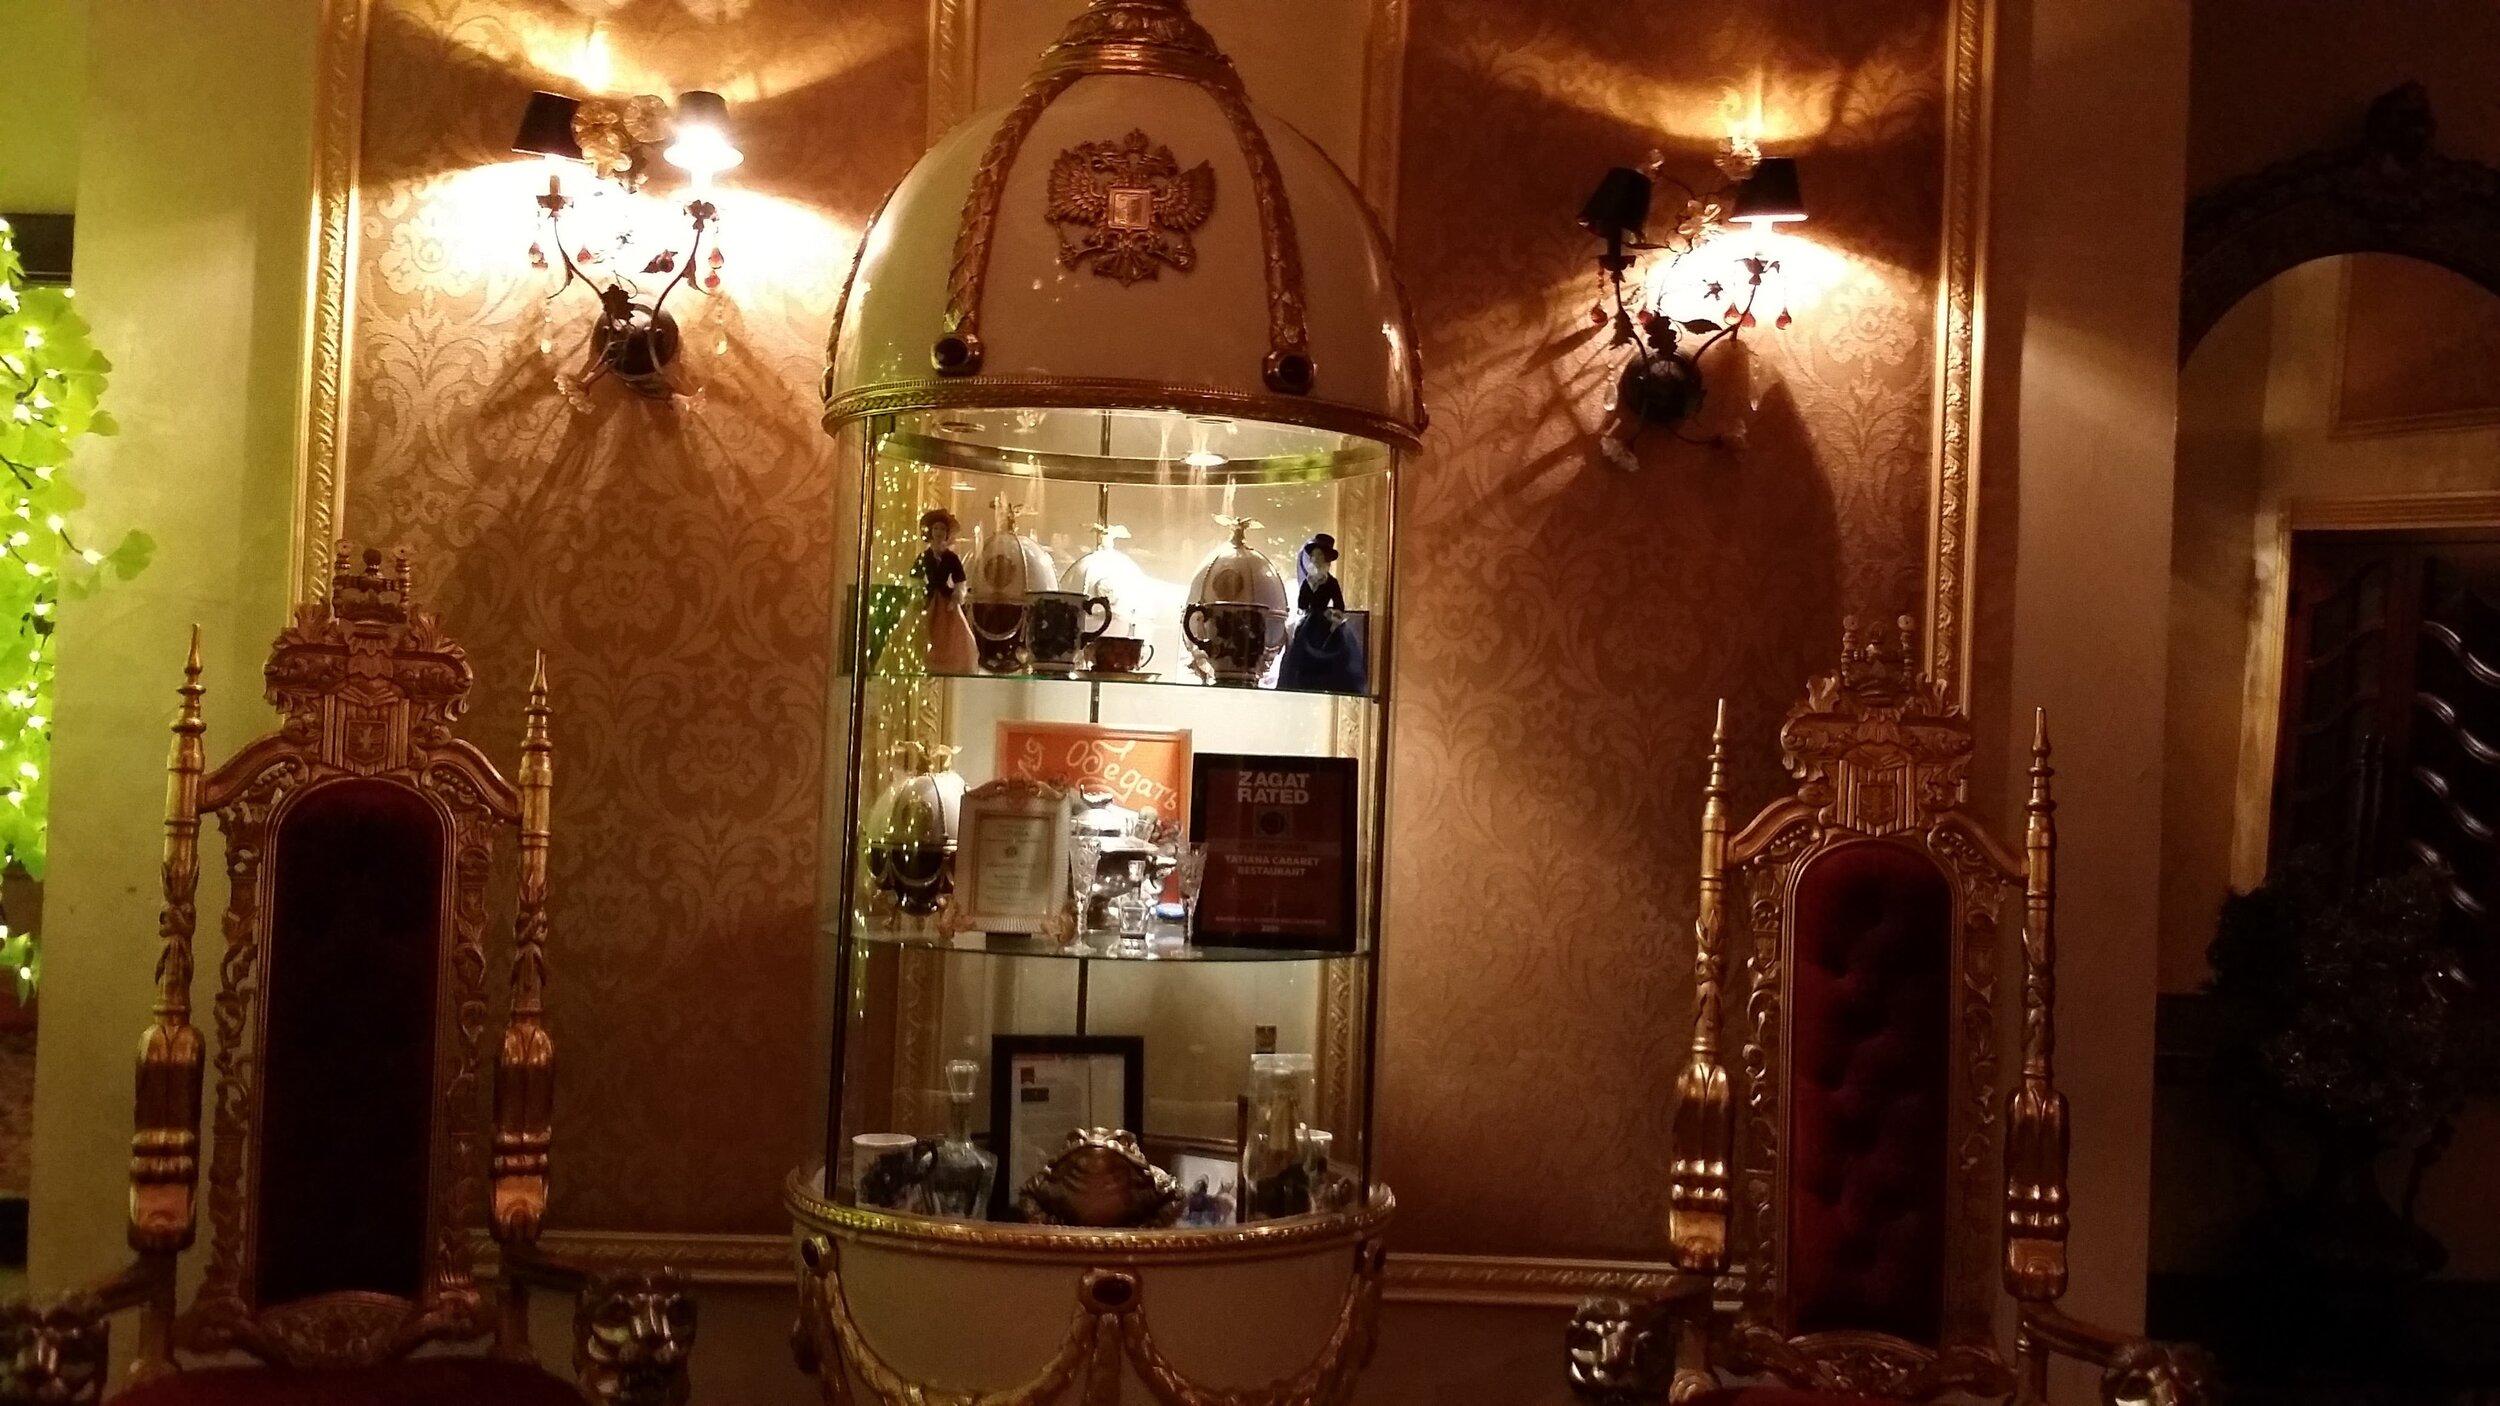 Tatiana, a hidden gem in Fort Lauderdale for Russian food